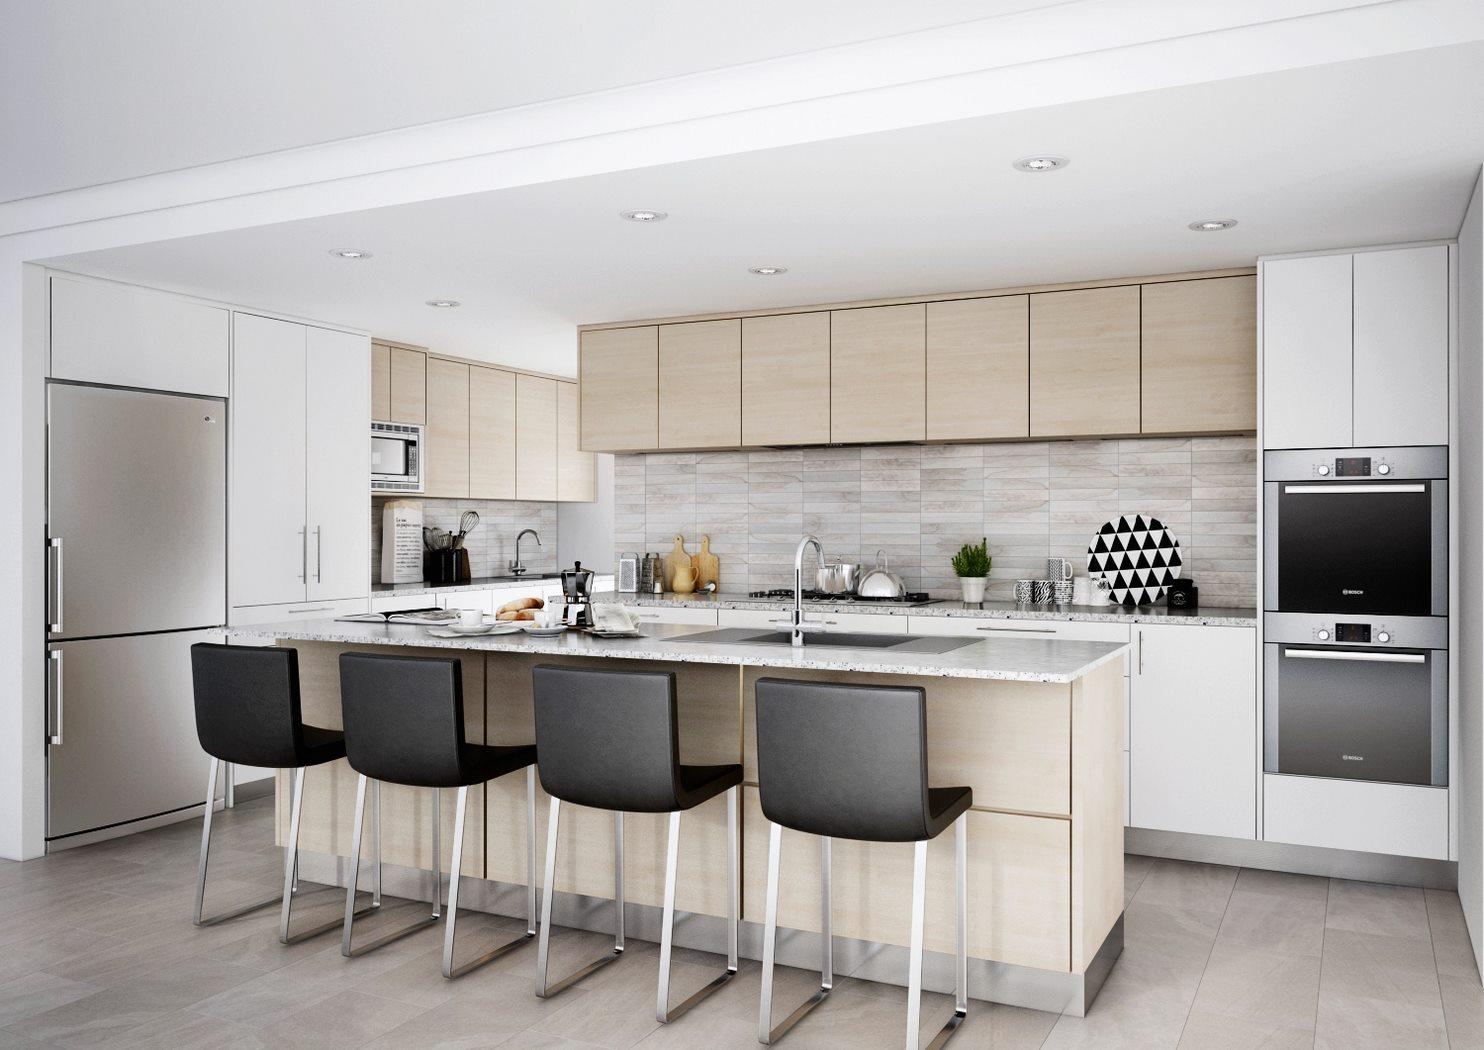 get kitchen 3d visualised - interior design services